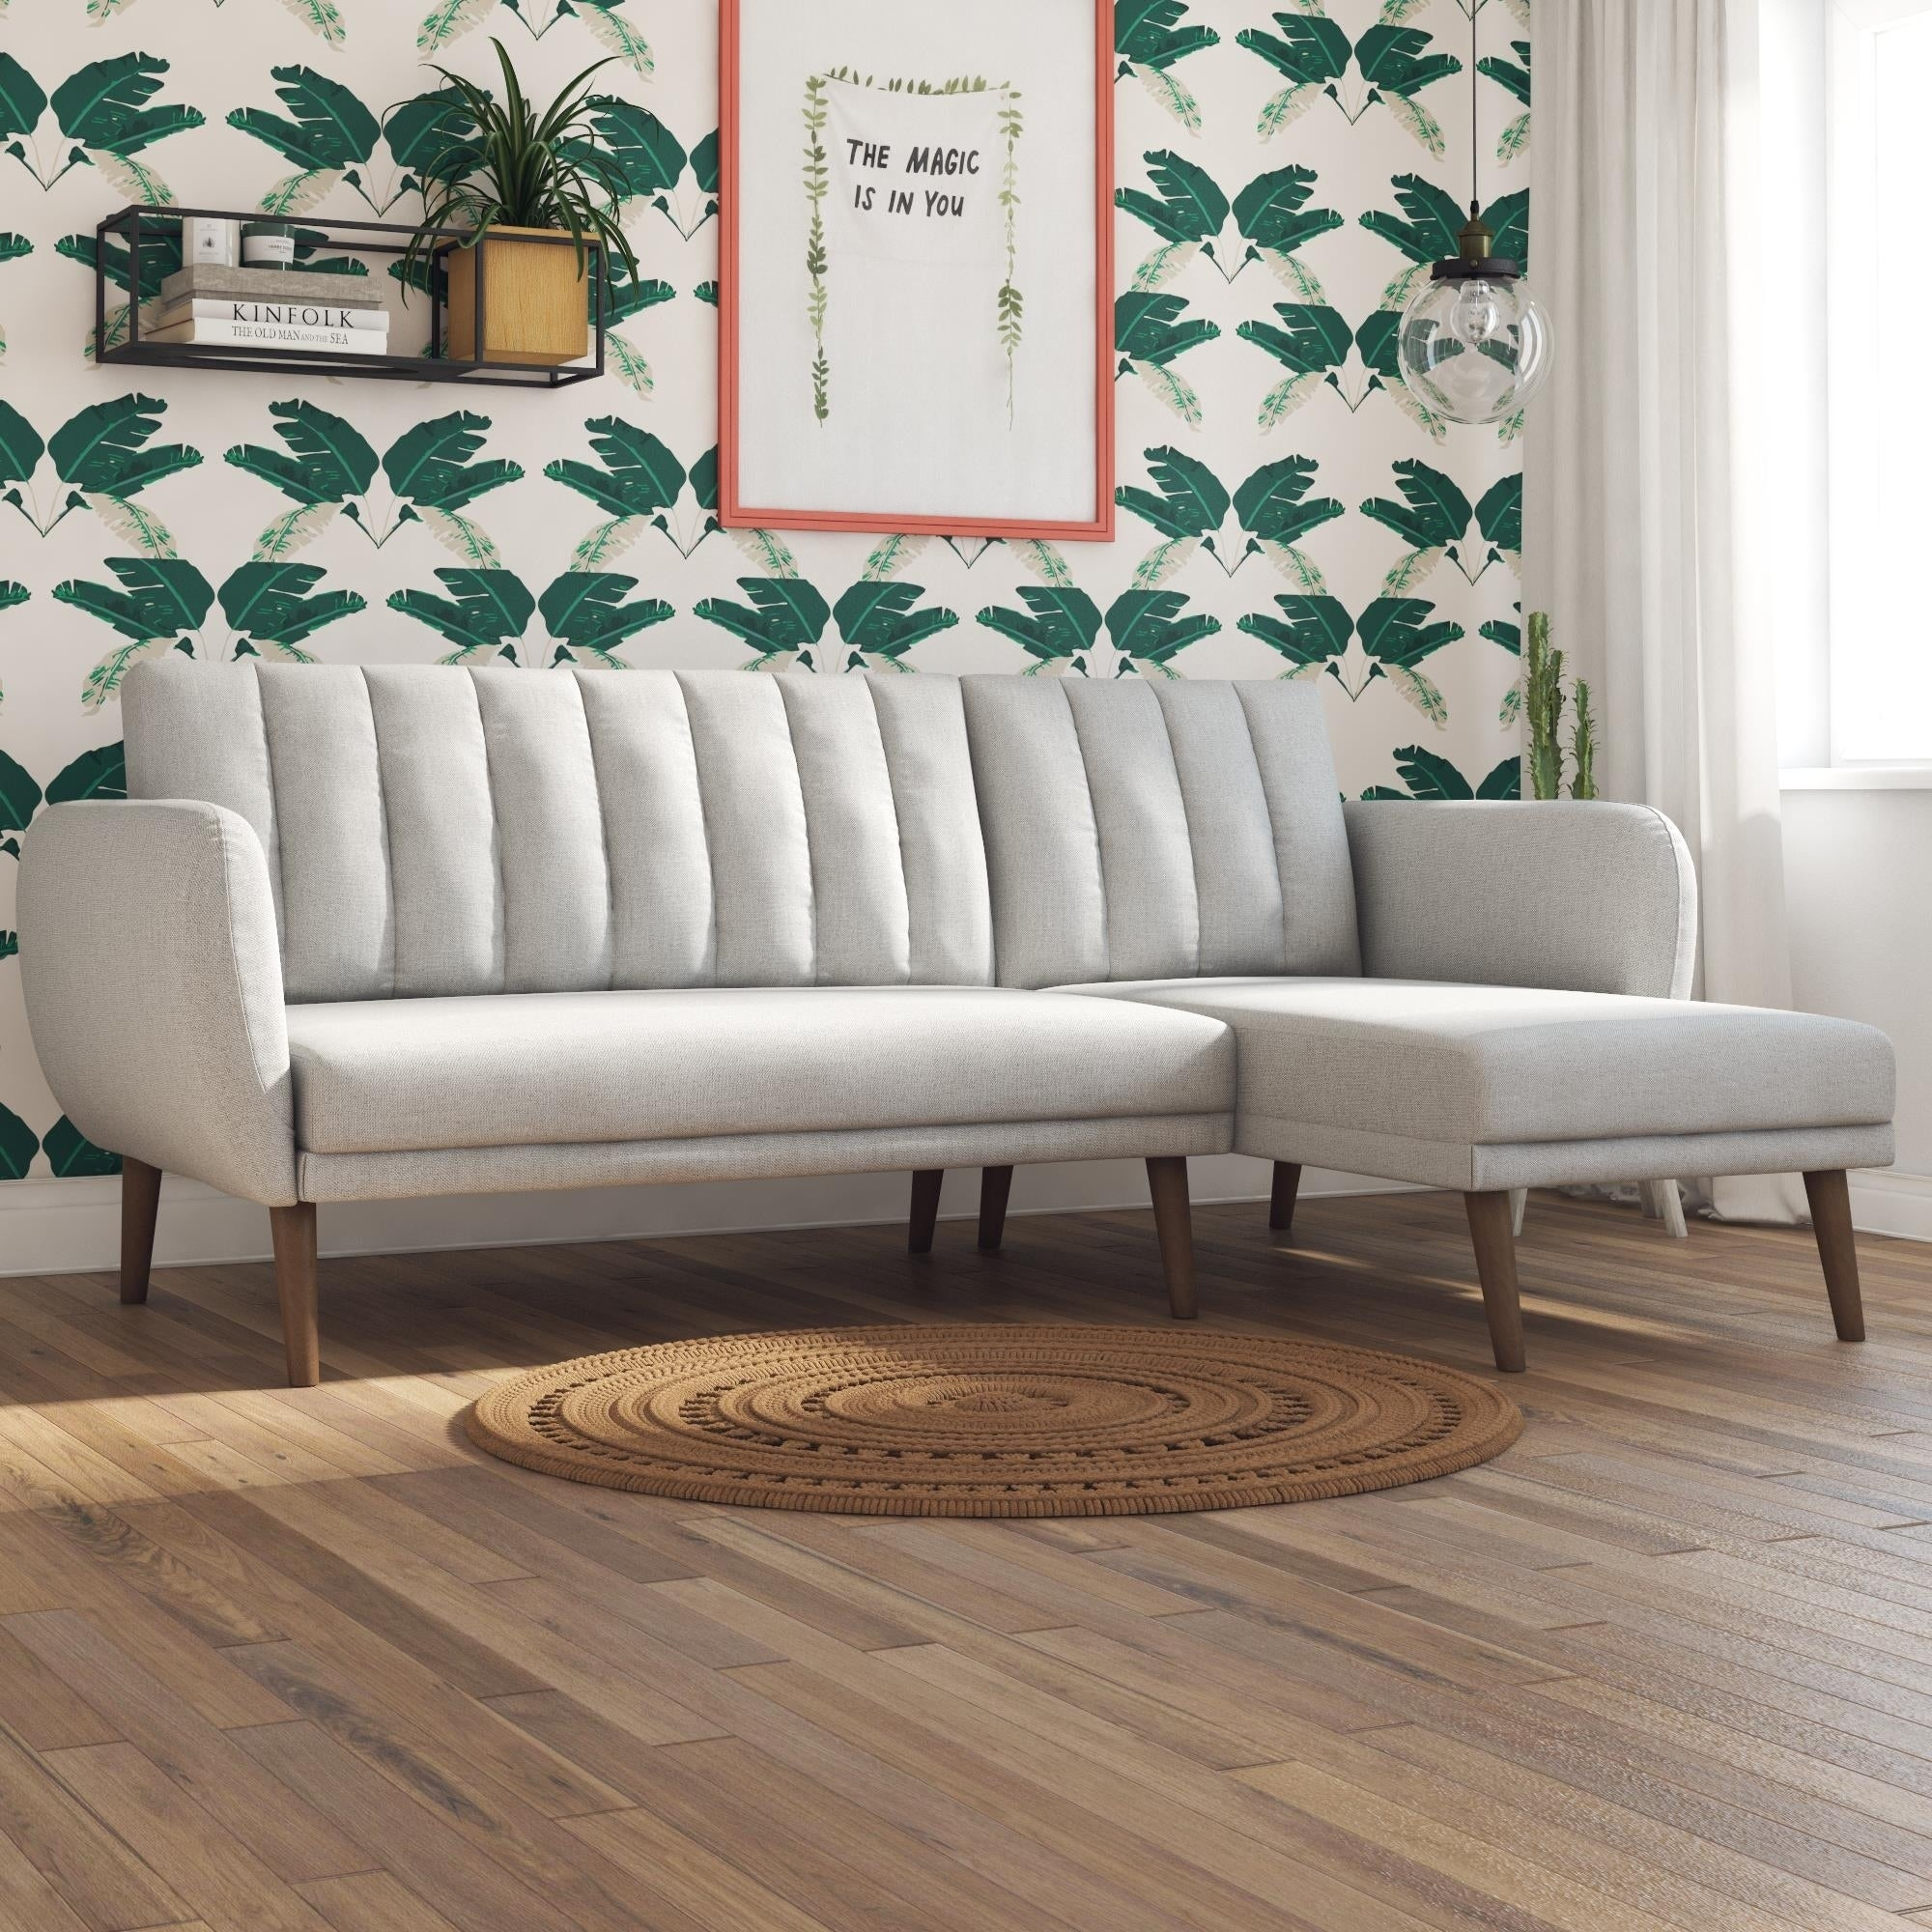 Shop Novogratz Brittany Sectional Futon Sofa - Free Shipping Today ...